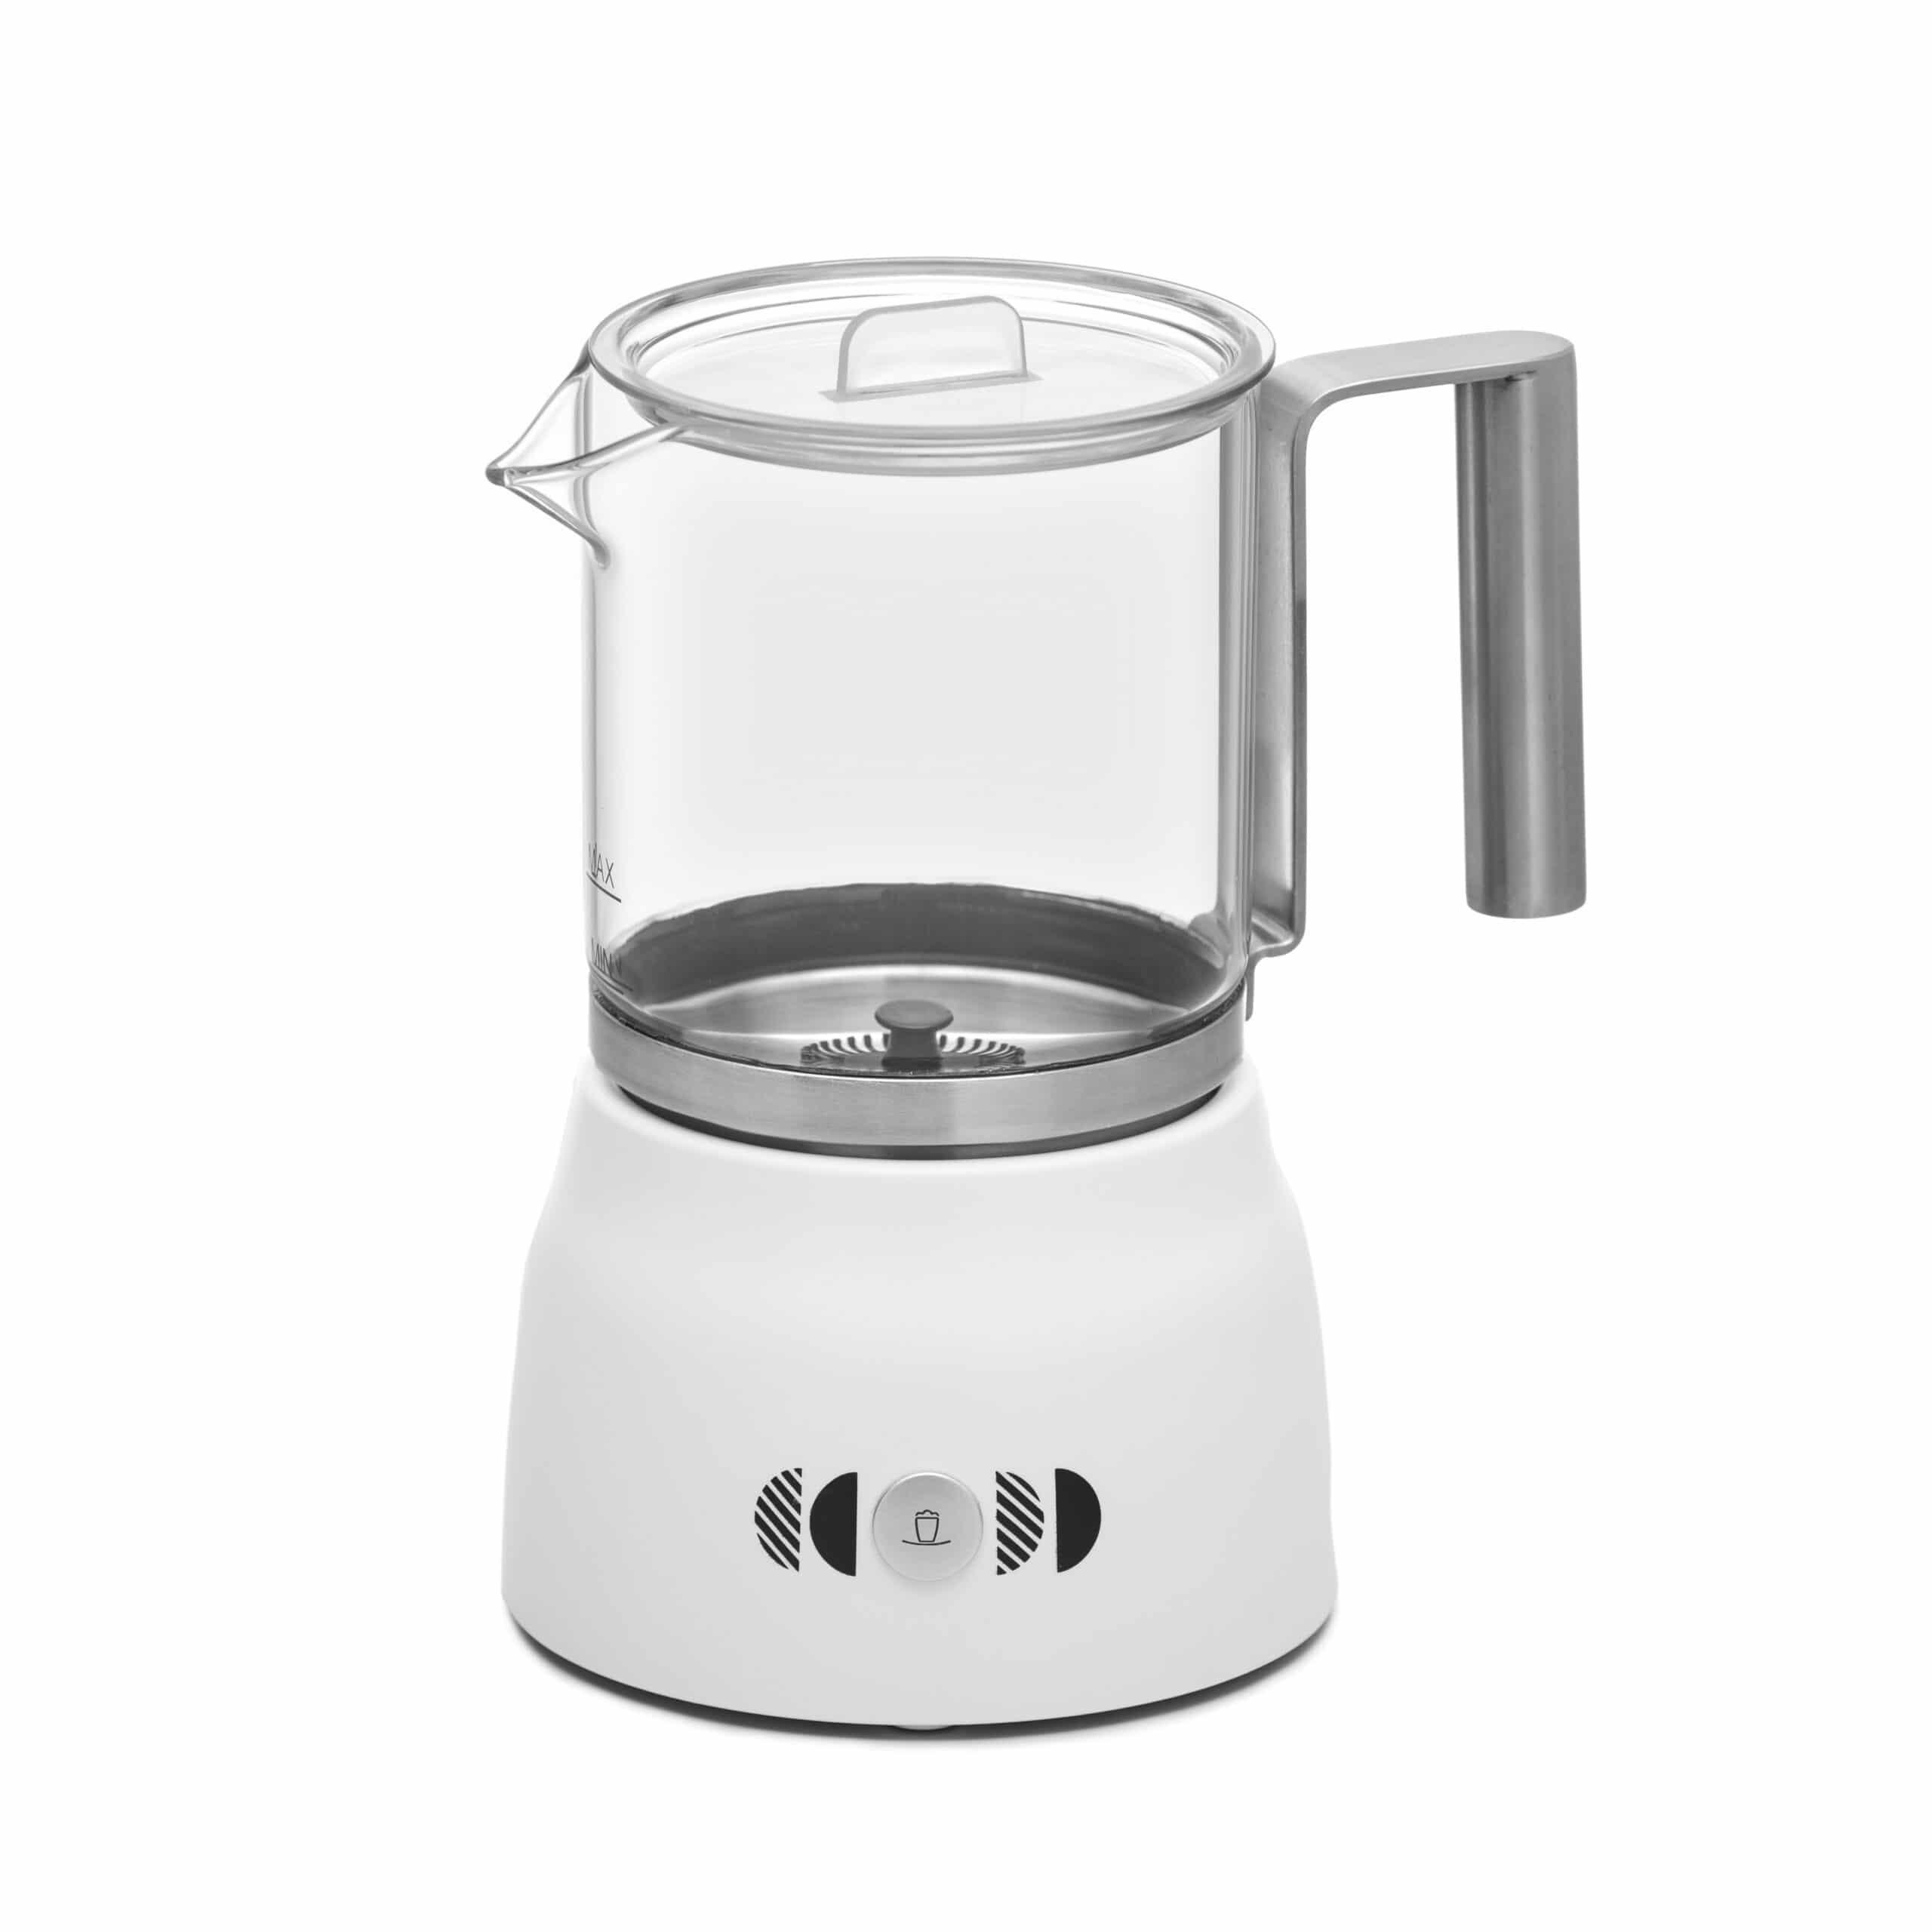 Capuccinador, Espumador, Vaporizador para leche Incapto Coffee color blanco